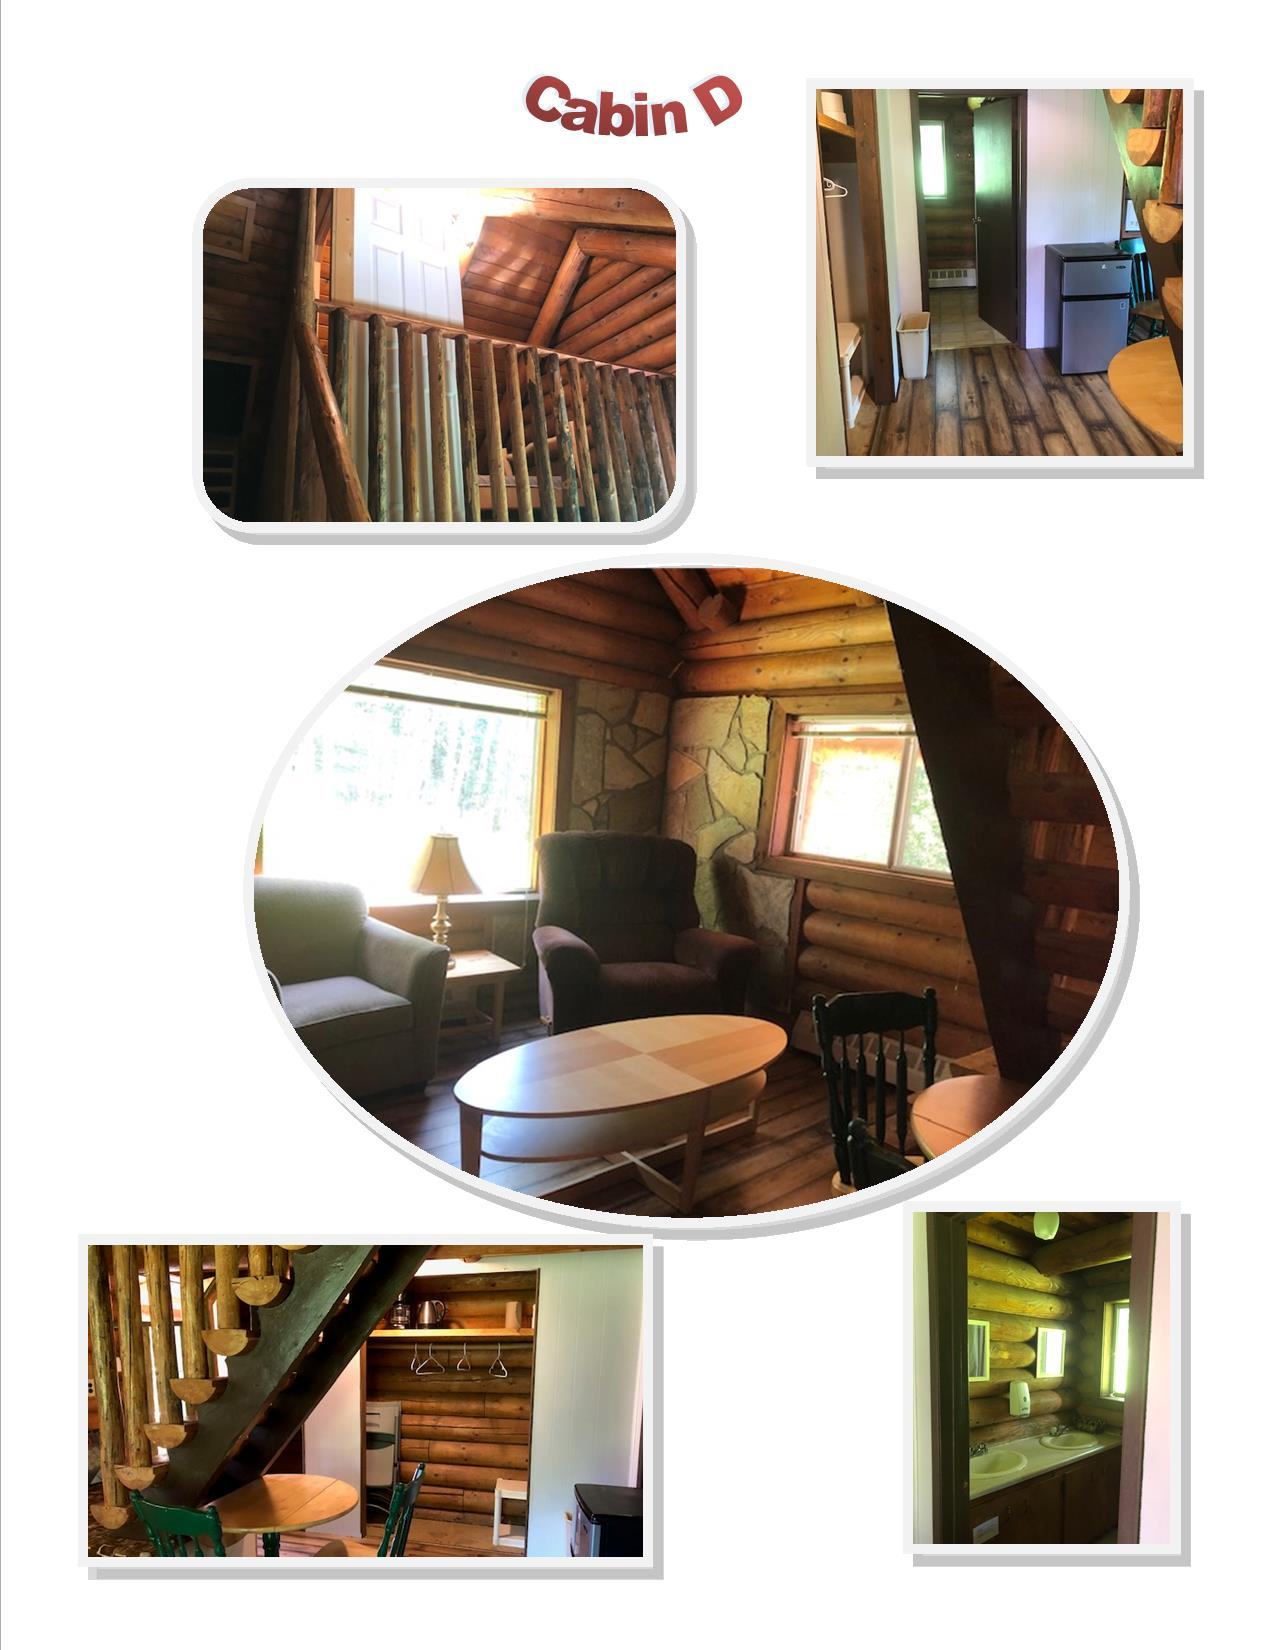 Cabin Rentals Cabin D